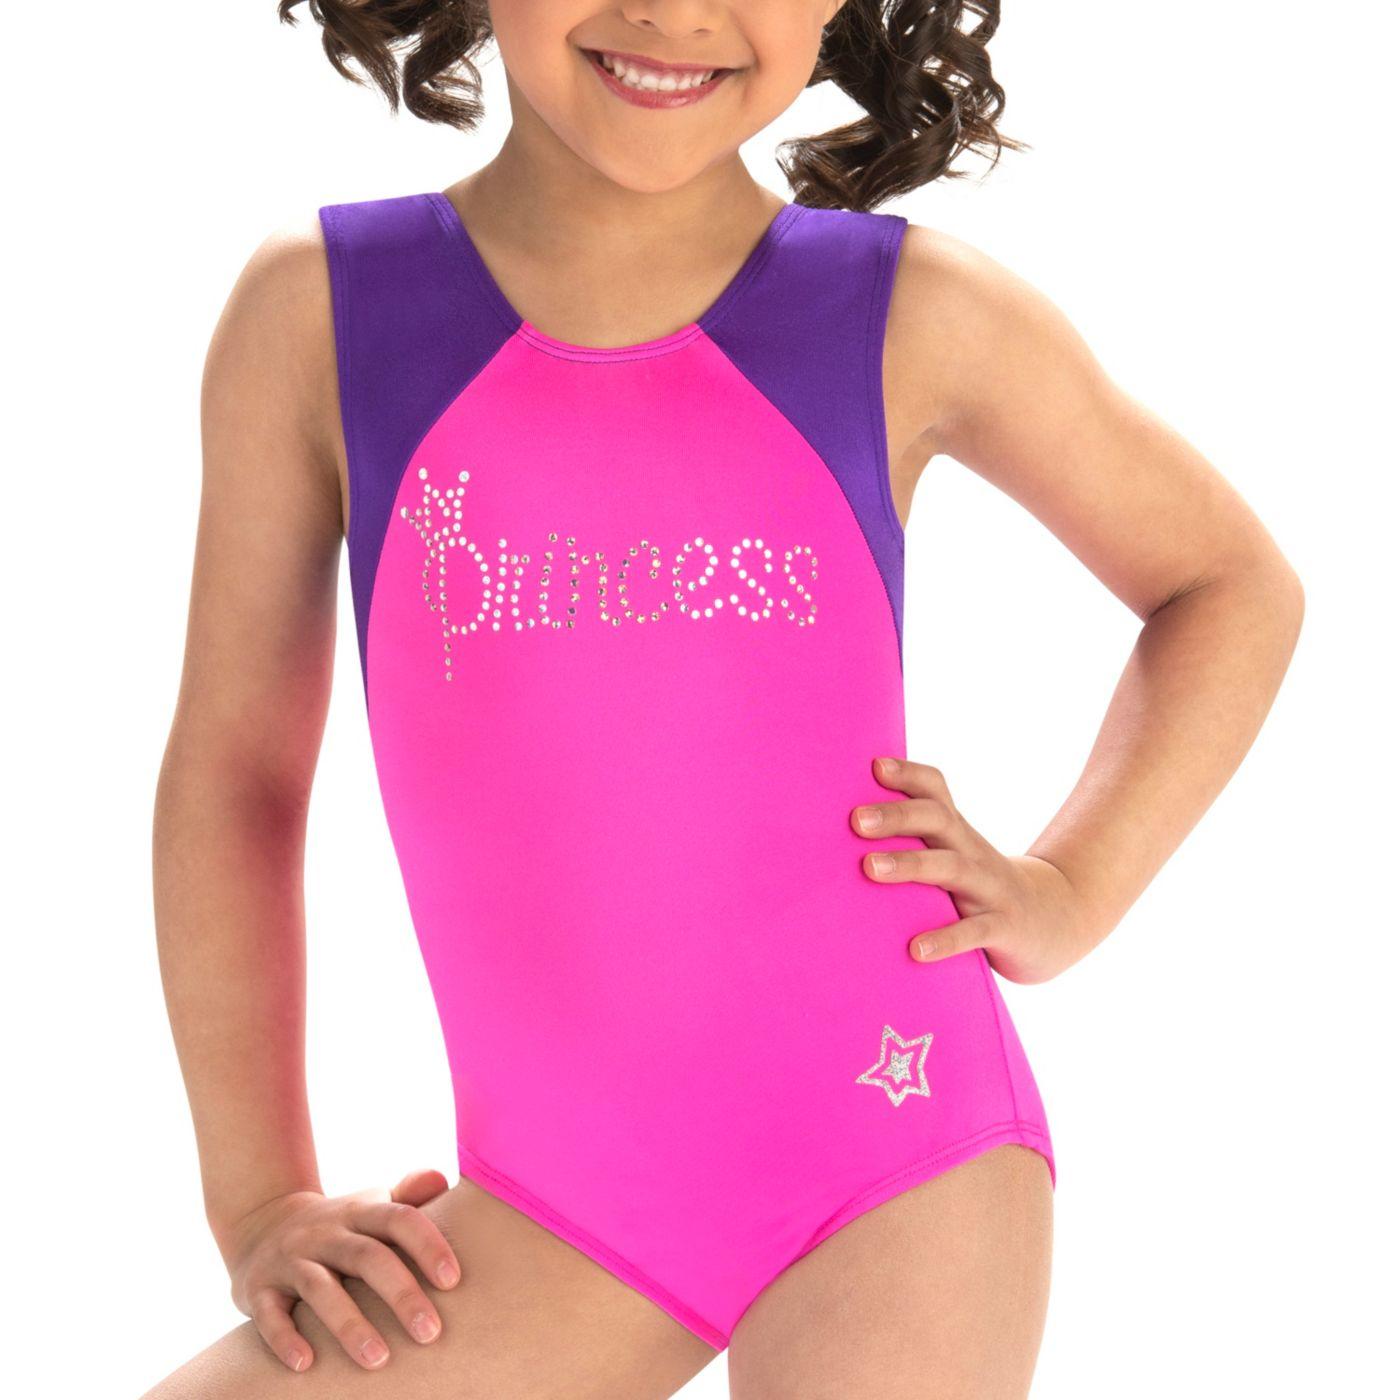 GK Elite Youth Sparkling Princess Gymnastics Leotard